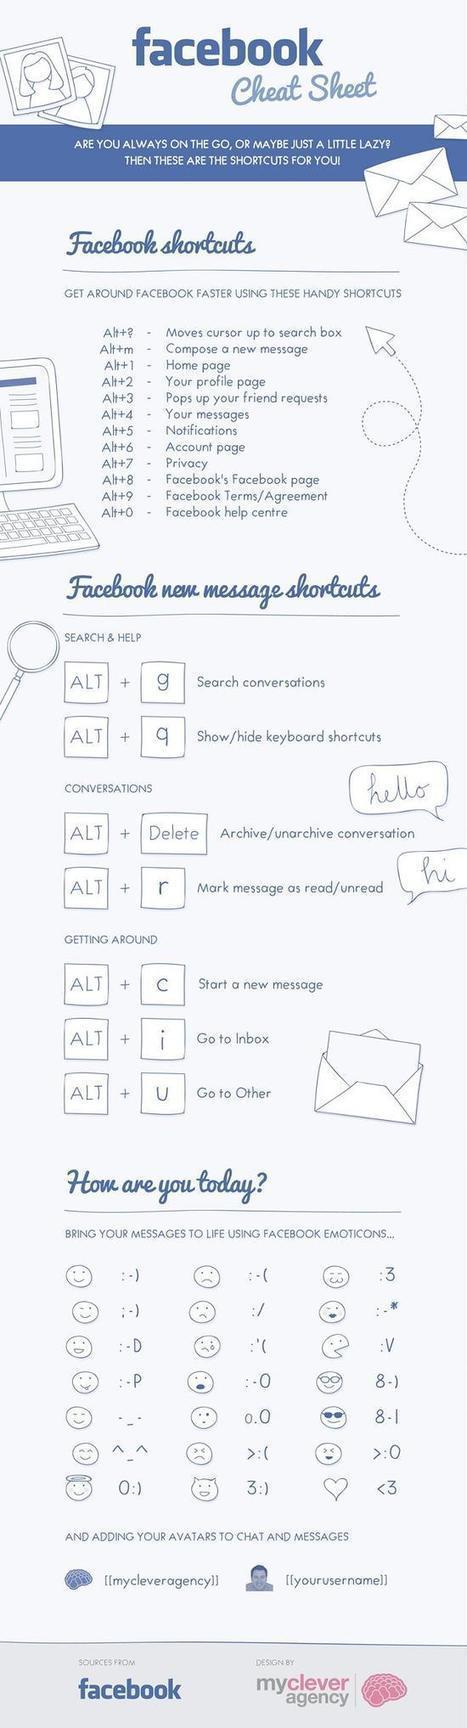 Atajos de teclado para FaceBook #infografia #infographic #socialmedia | Seo, Social Media Marketing | Scoop.it